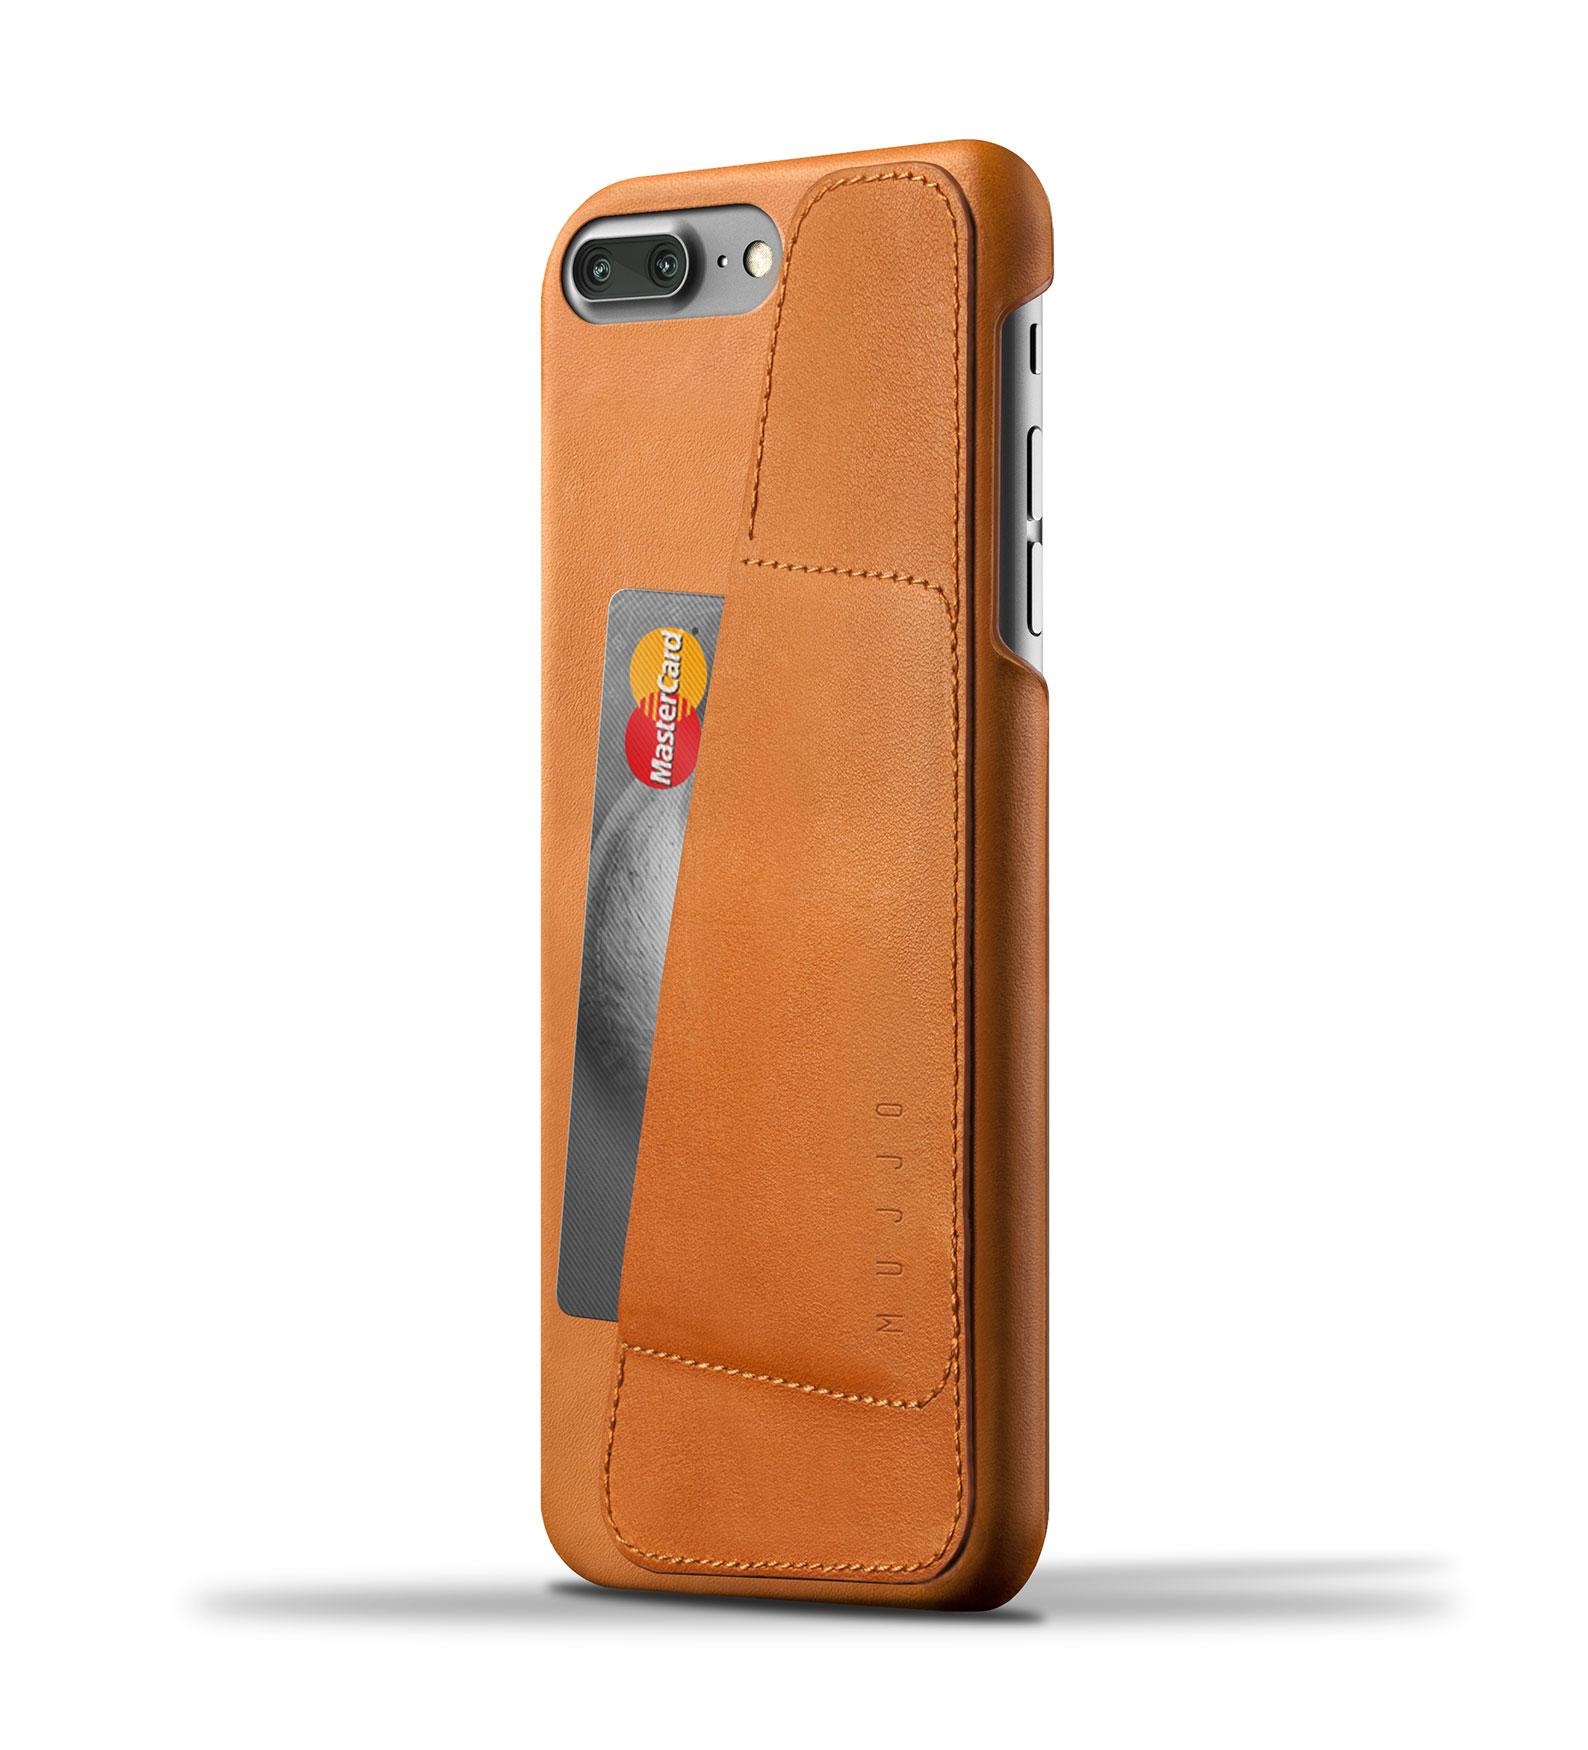 Mujjo Leather Wallet Case iPhone 7 Plus Tan